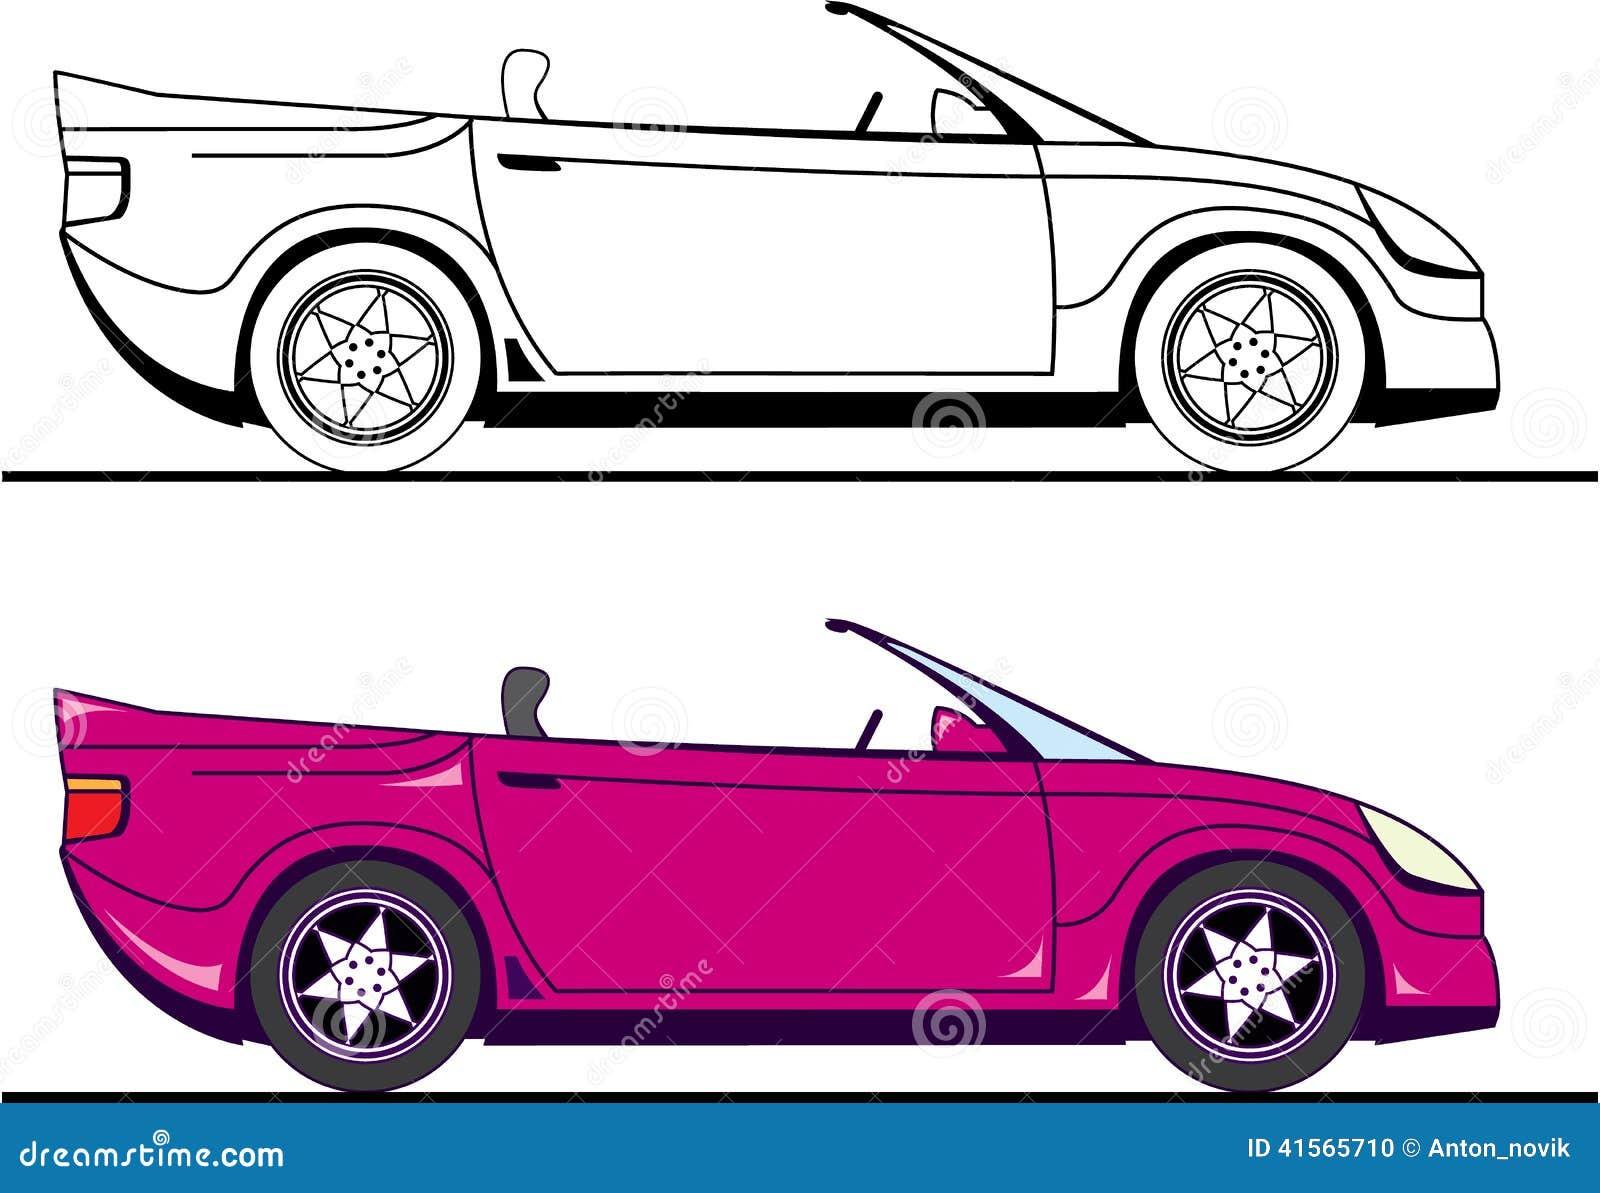 car clip art illustrations - photo #38